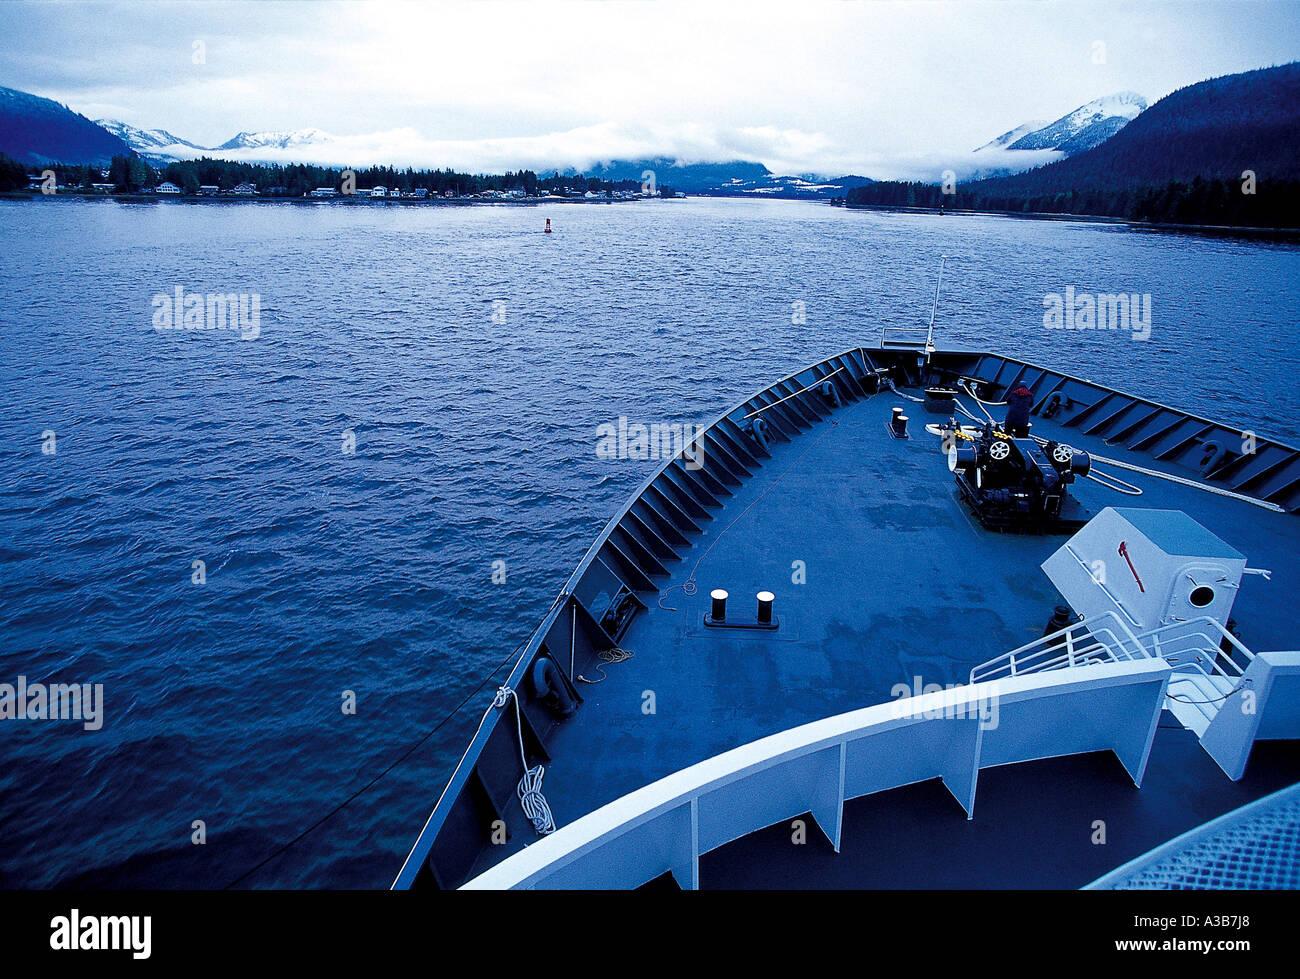 ship,ships,deck,boat head,lake,scene,landscape,sce - Stock Image